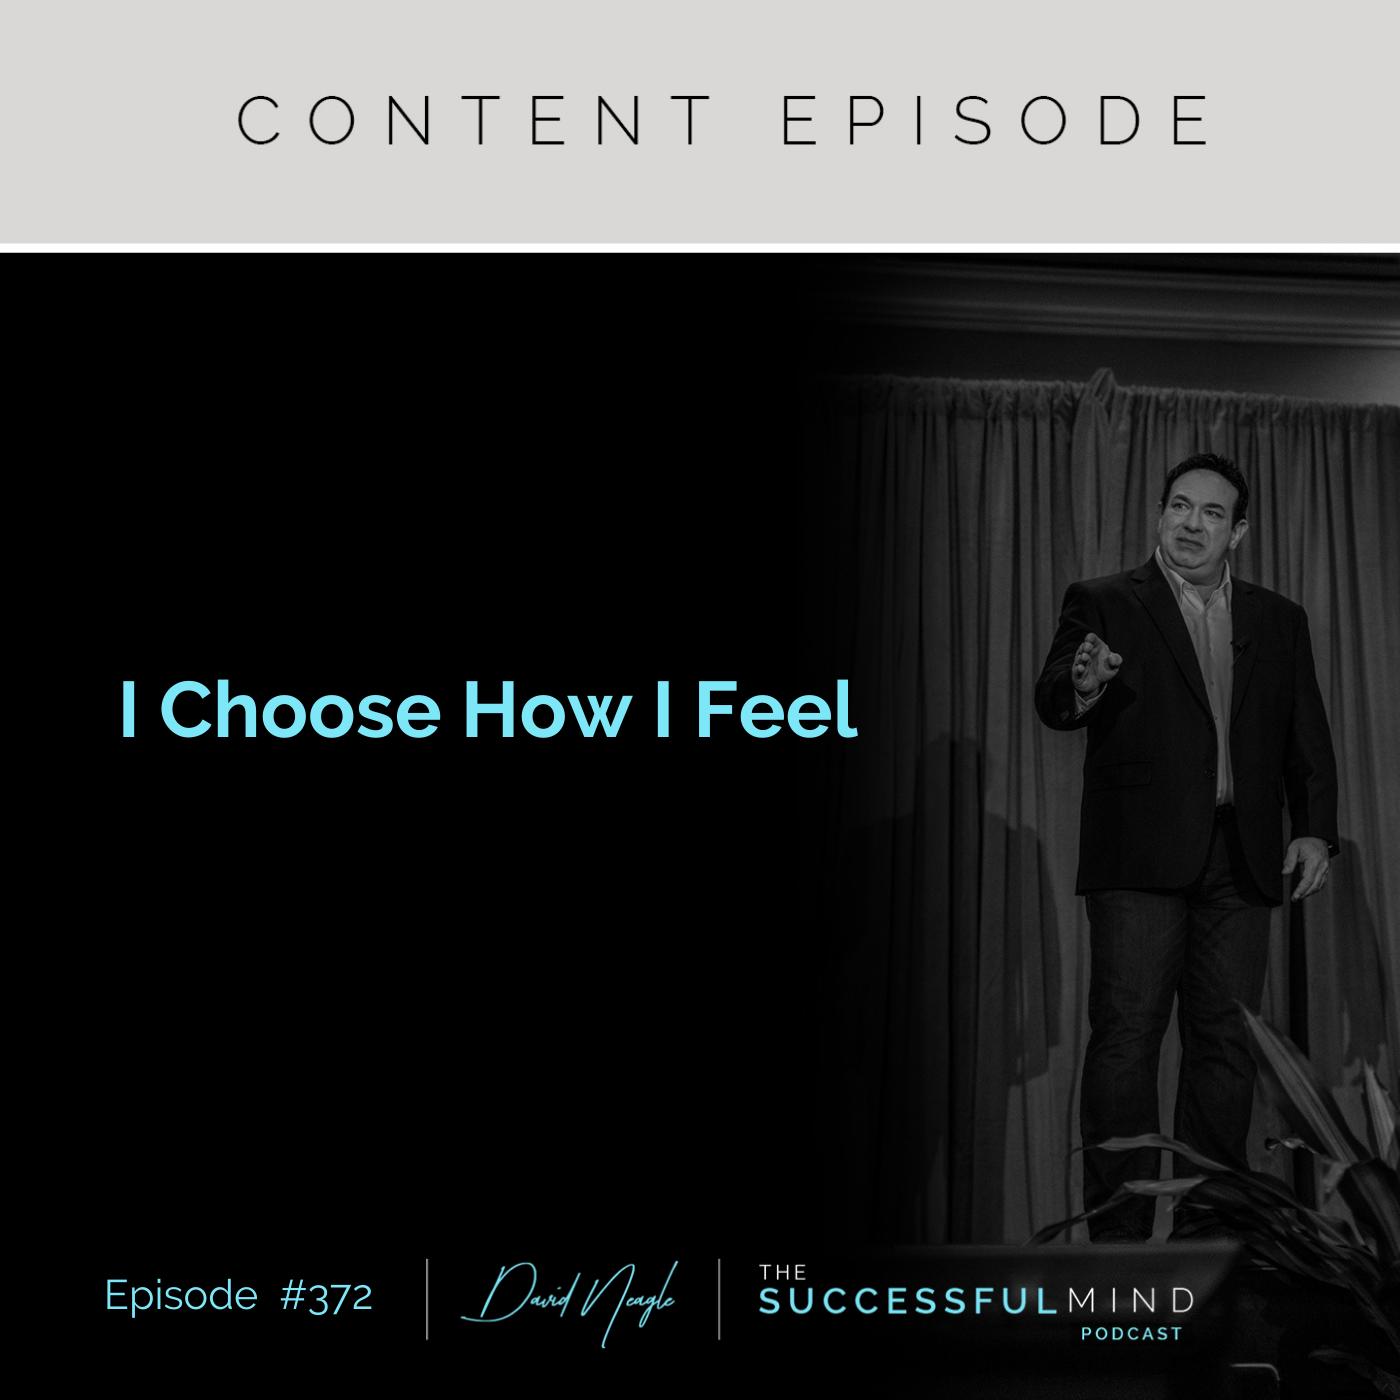 The Successful Mind Podcast – Episode 372 – I Choose How I Feel